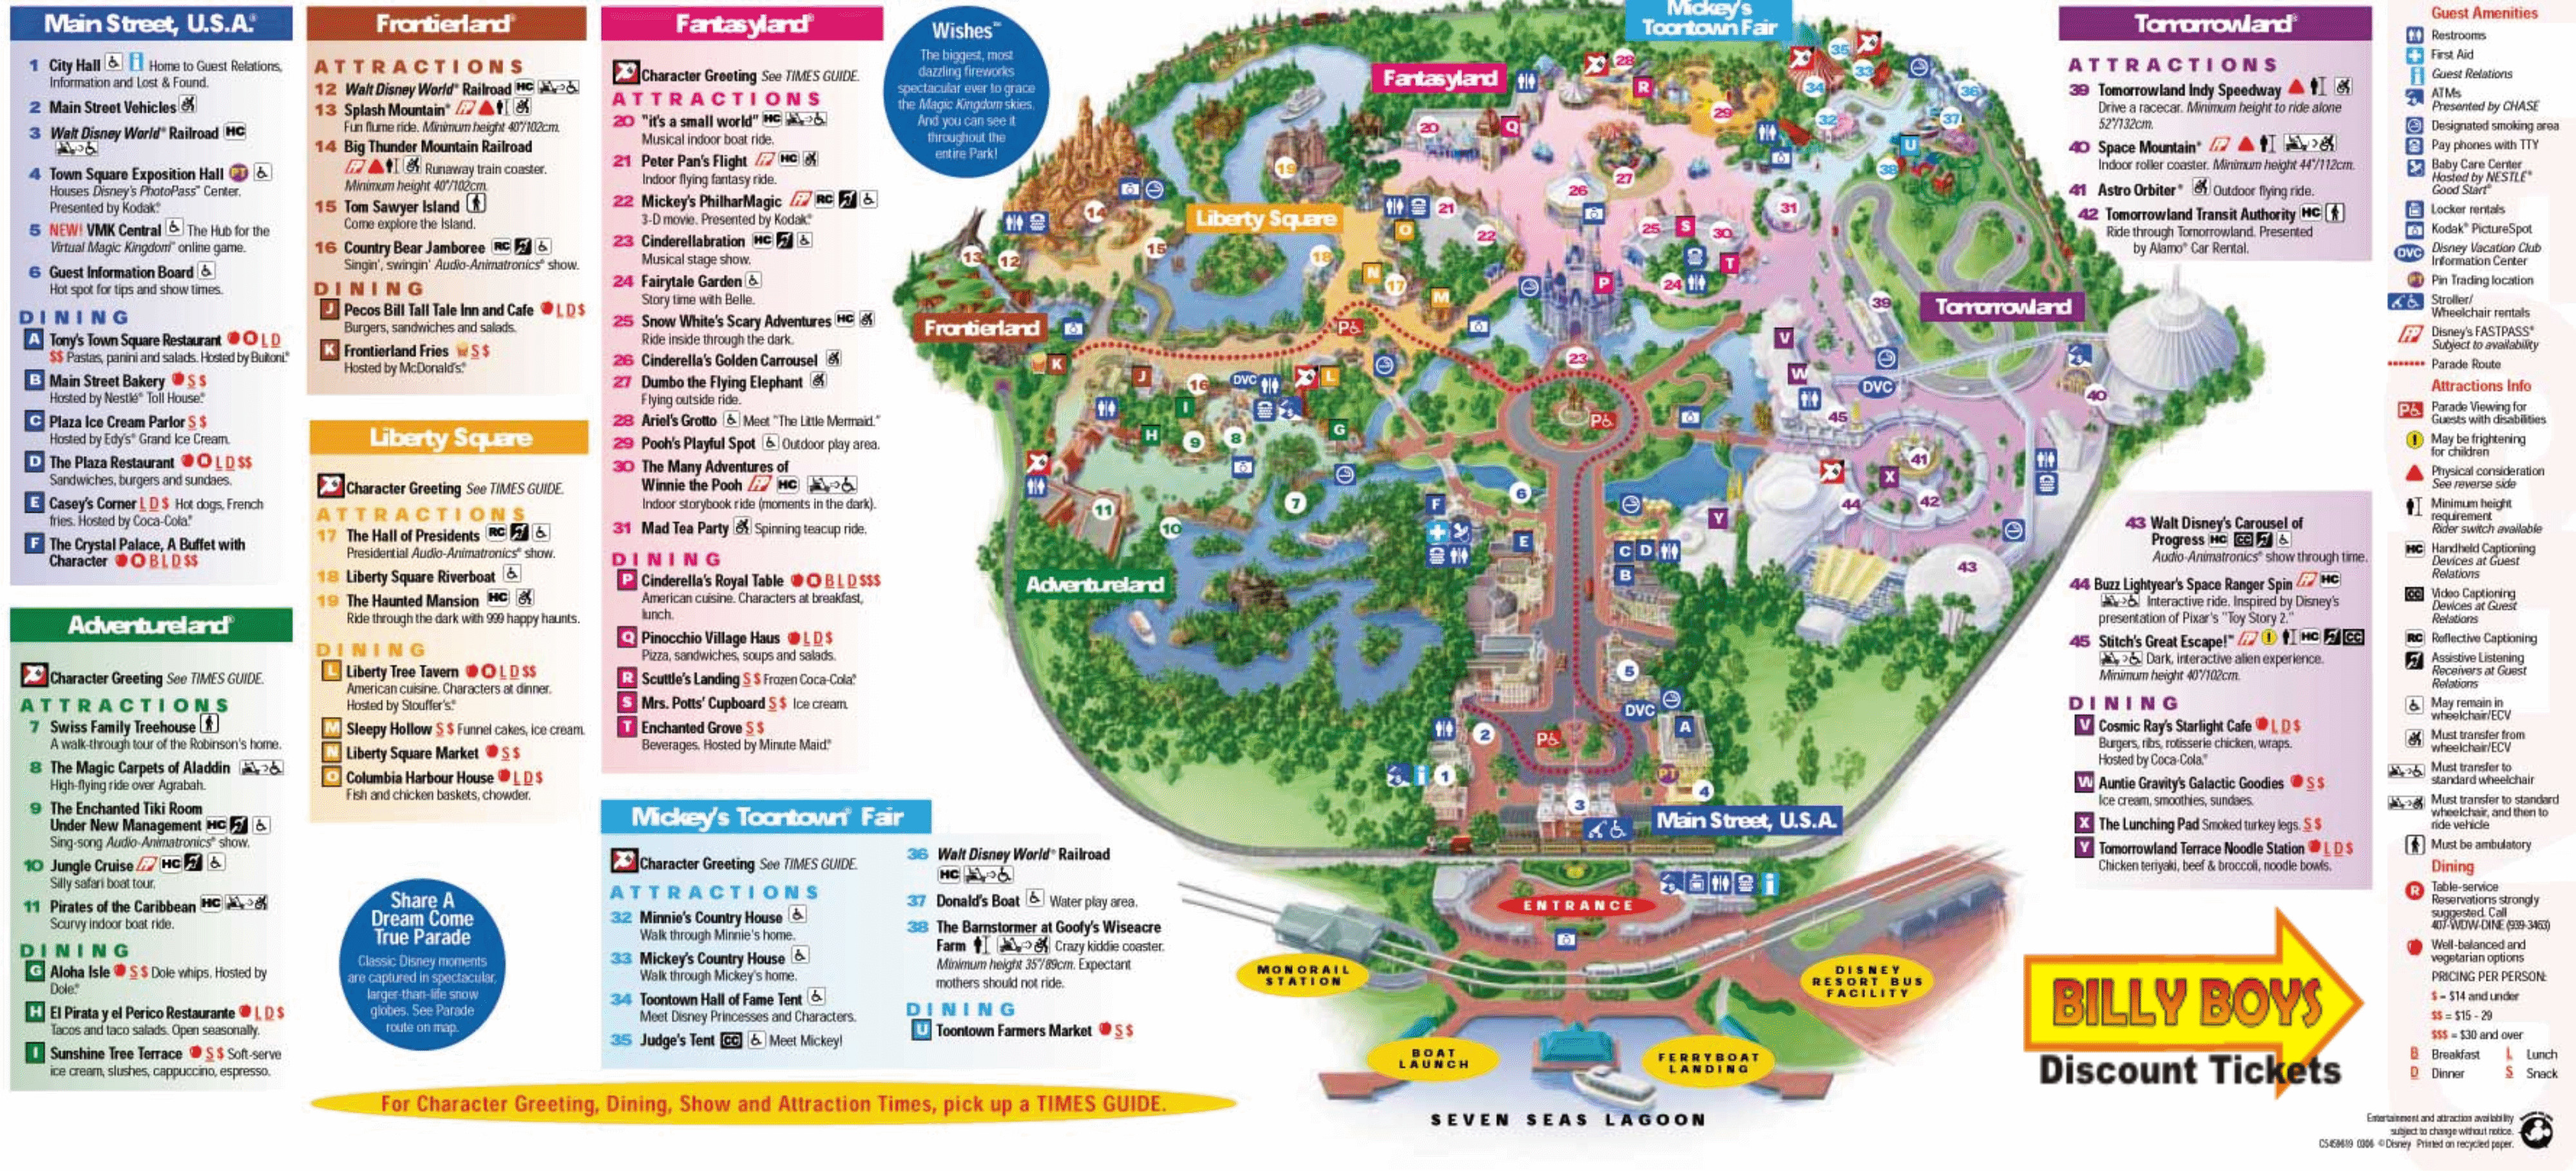 Disney World Florida Map From Ambergontrail 3 - Judecelestin2010 - Disney Springs Florida Map